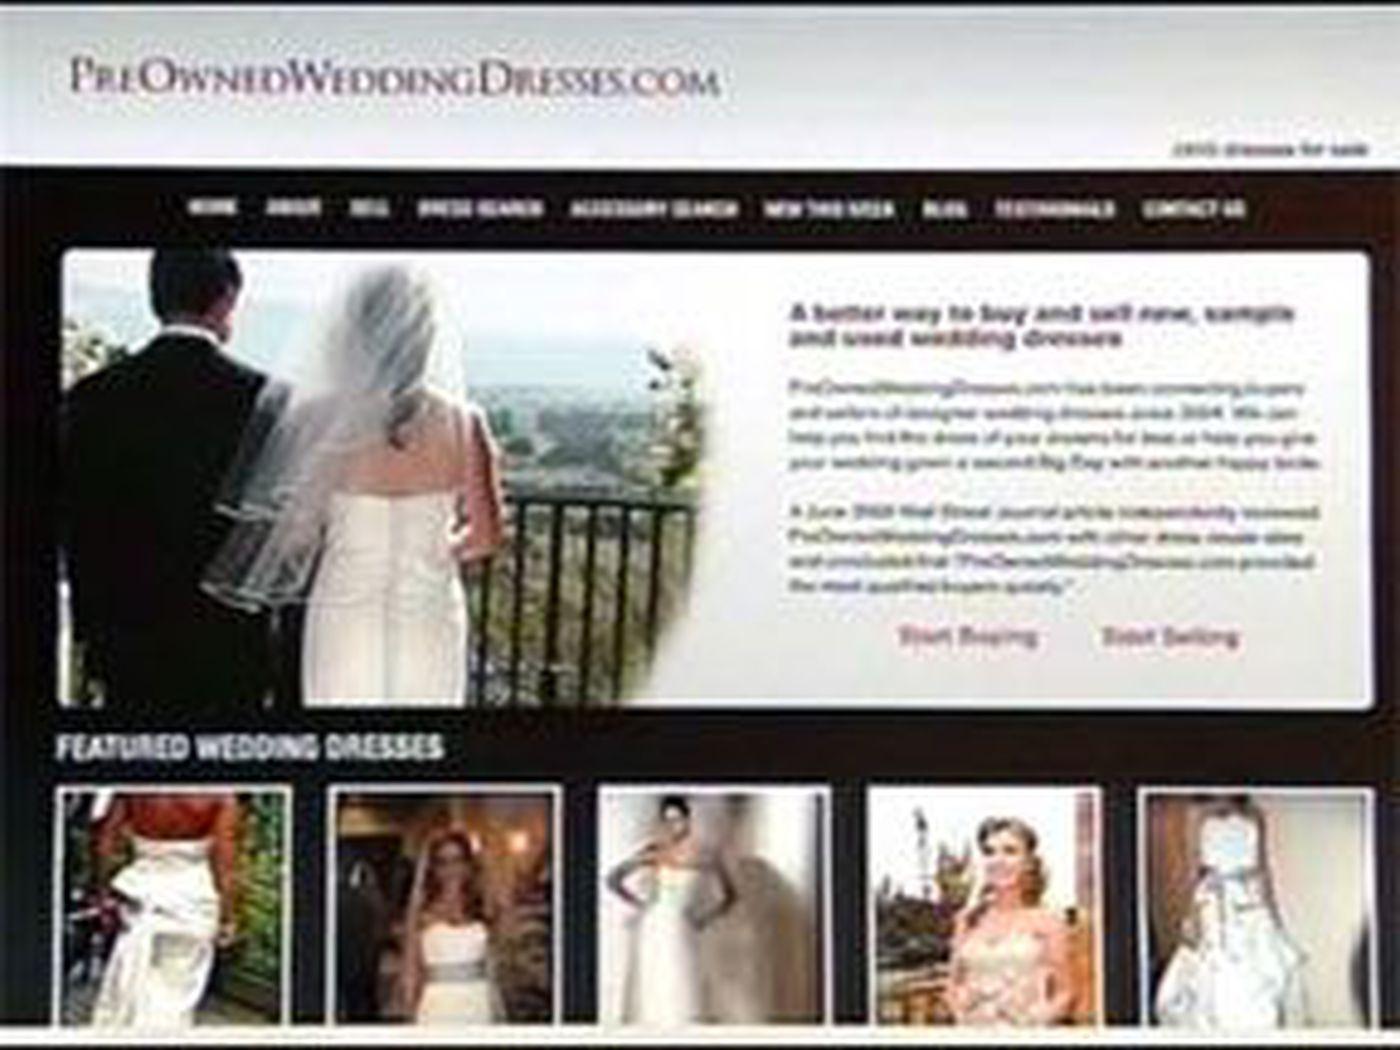 Virtual Wedding Dress Swap